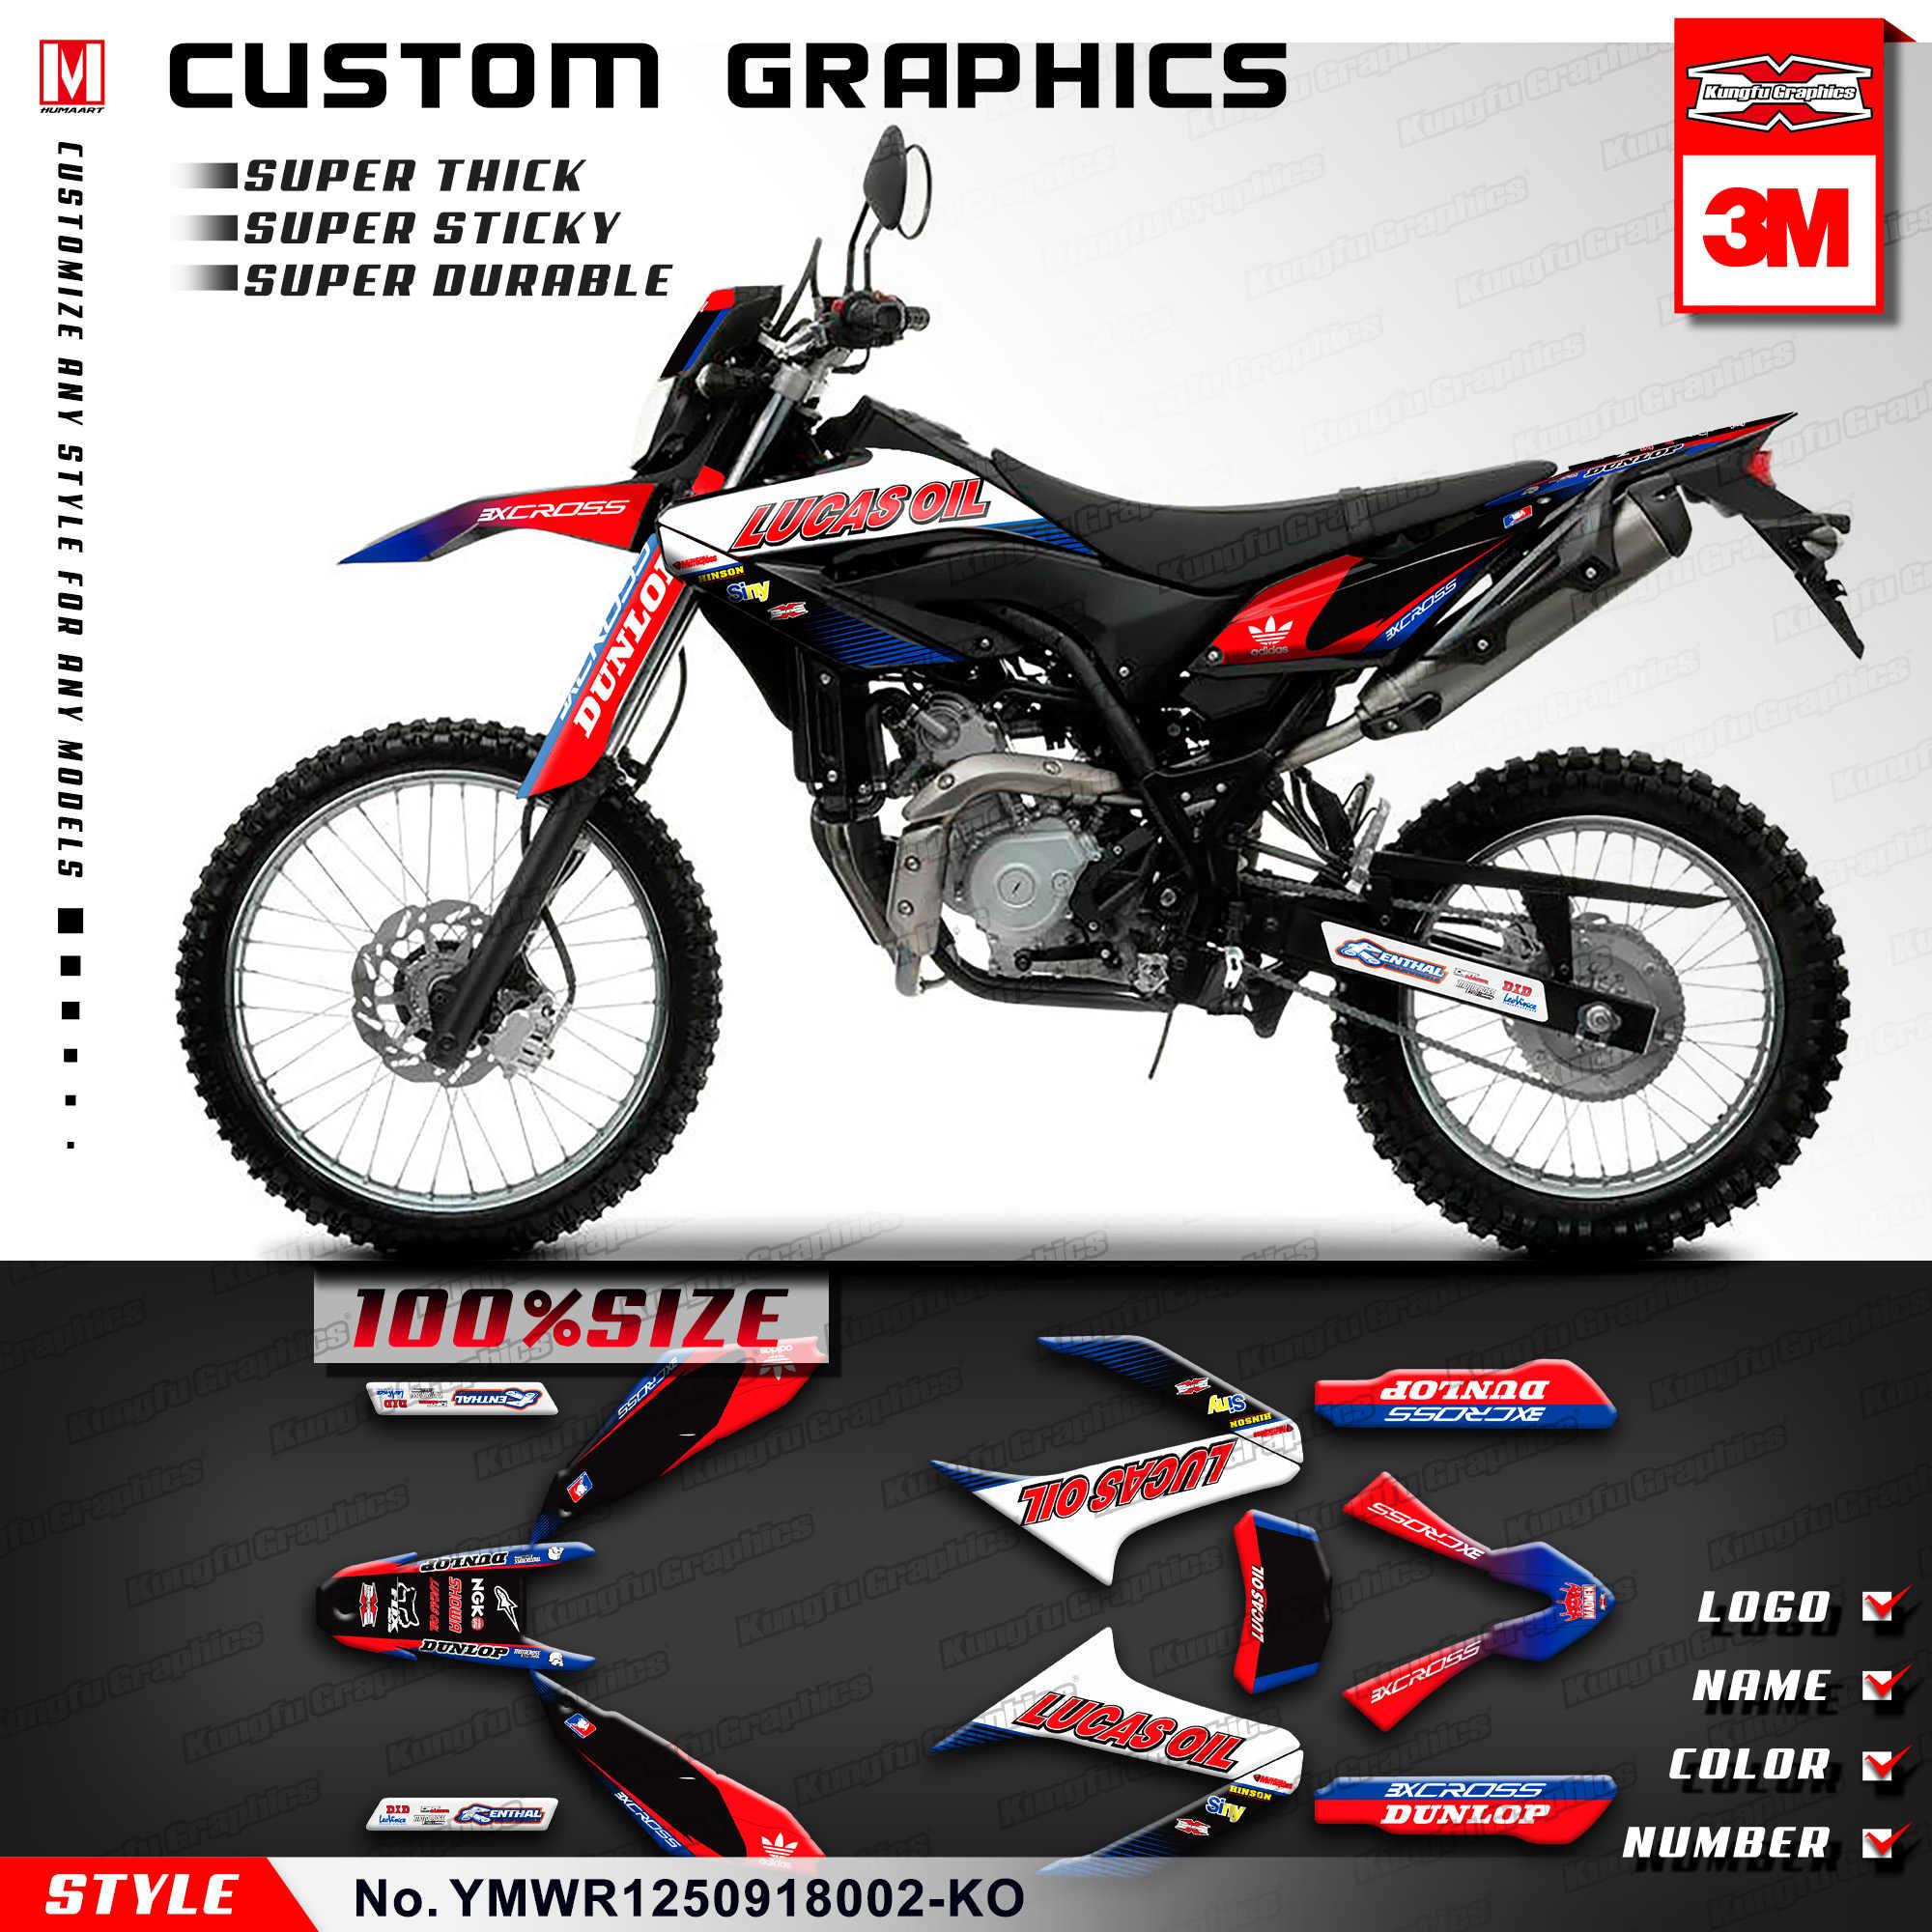 Kungfu graphics personalised sticker kit for yamaha wr 125 r